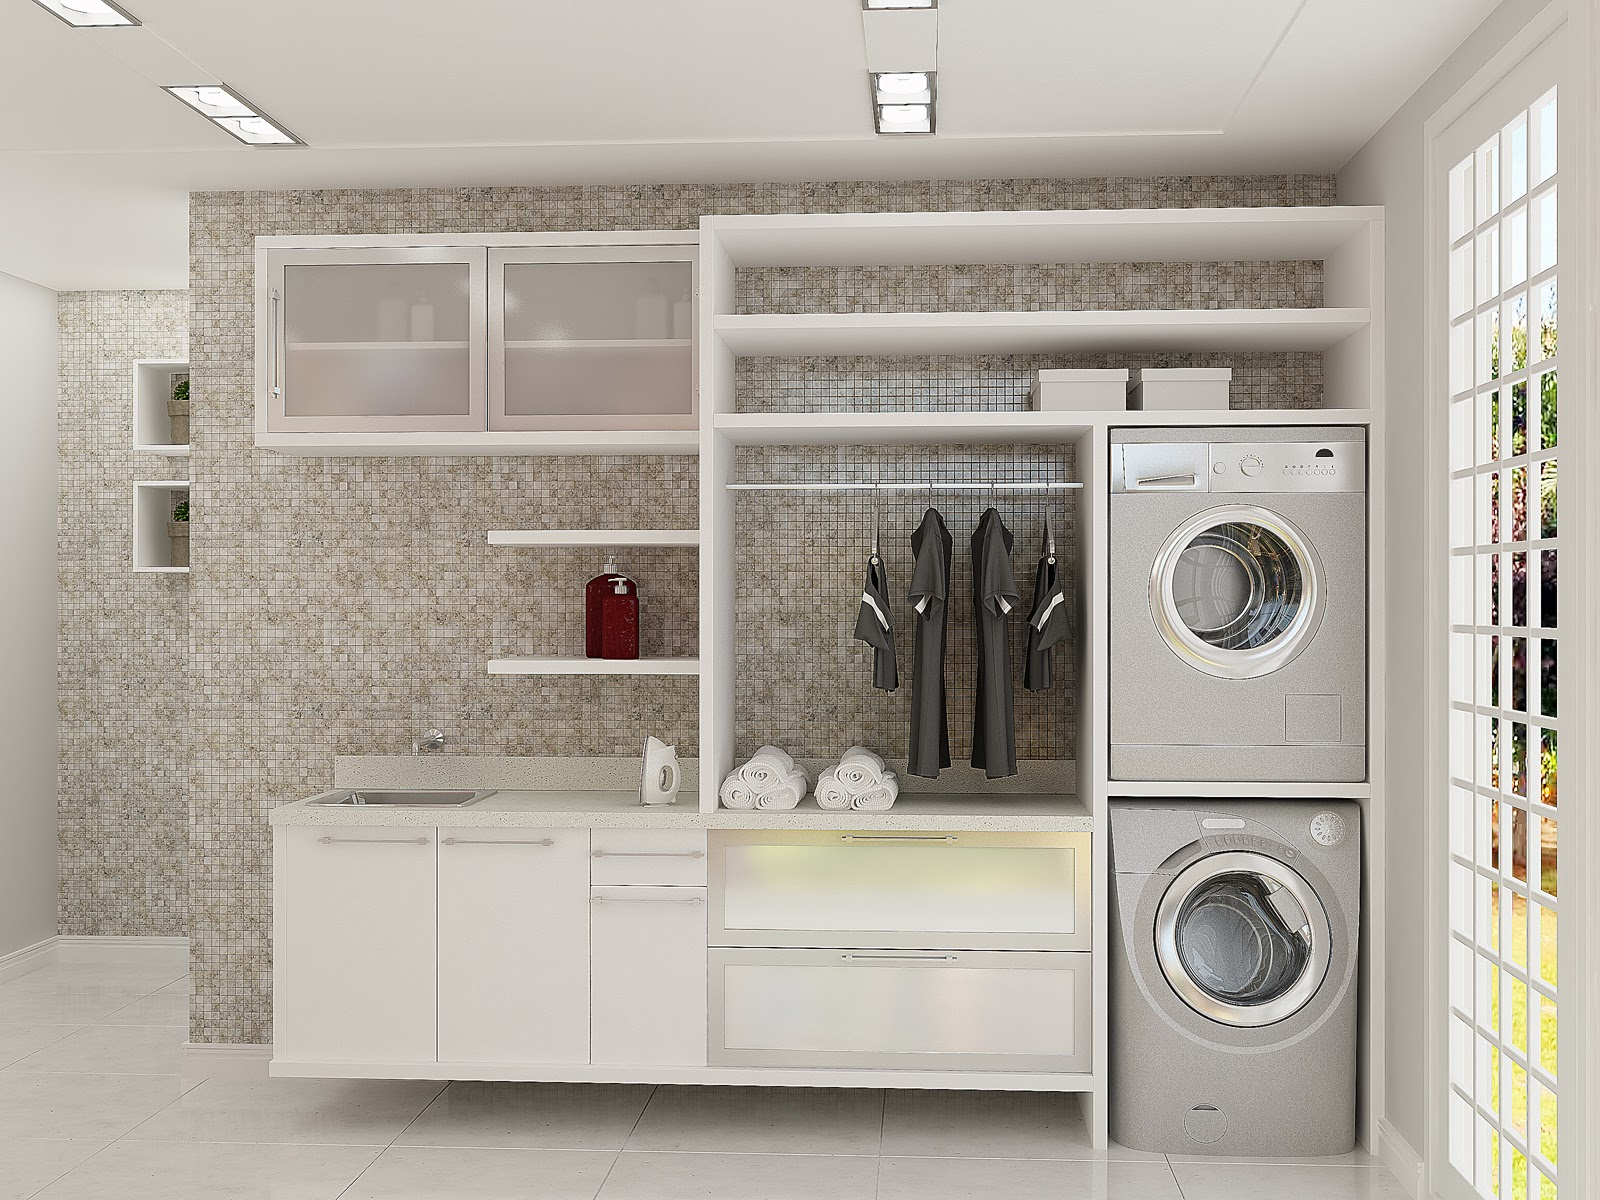 Construindo Minha Casa Clean: Casa Montada! Moderna Branca e Clean!! #977234 1600 1200